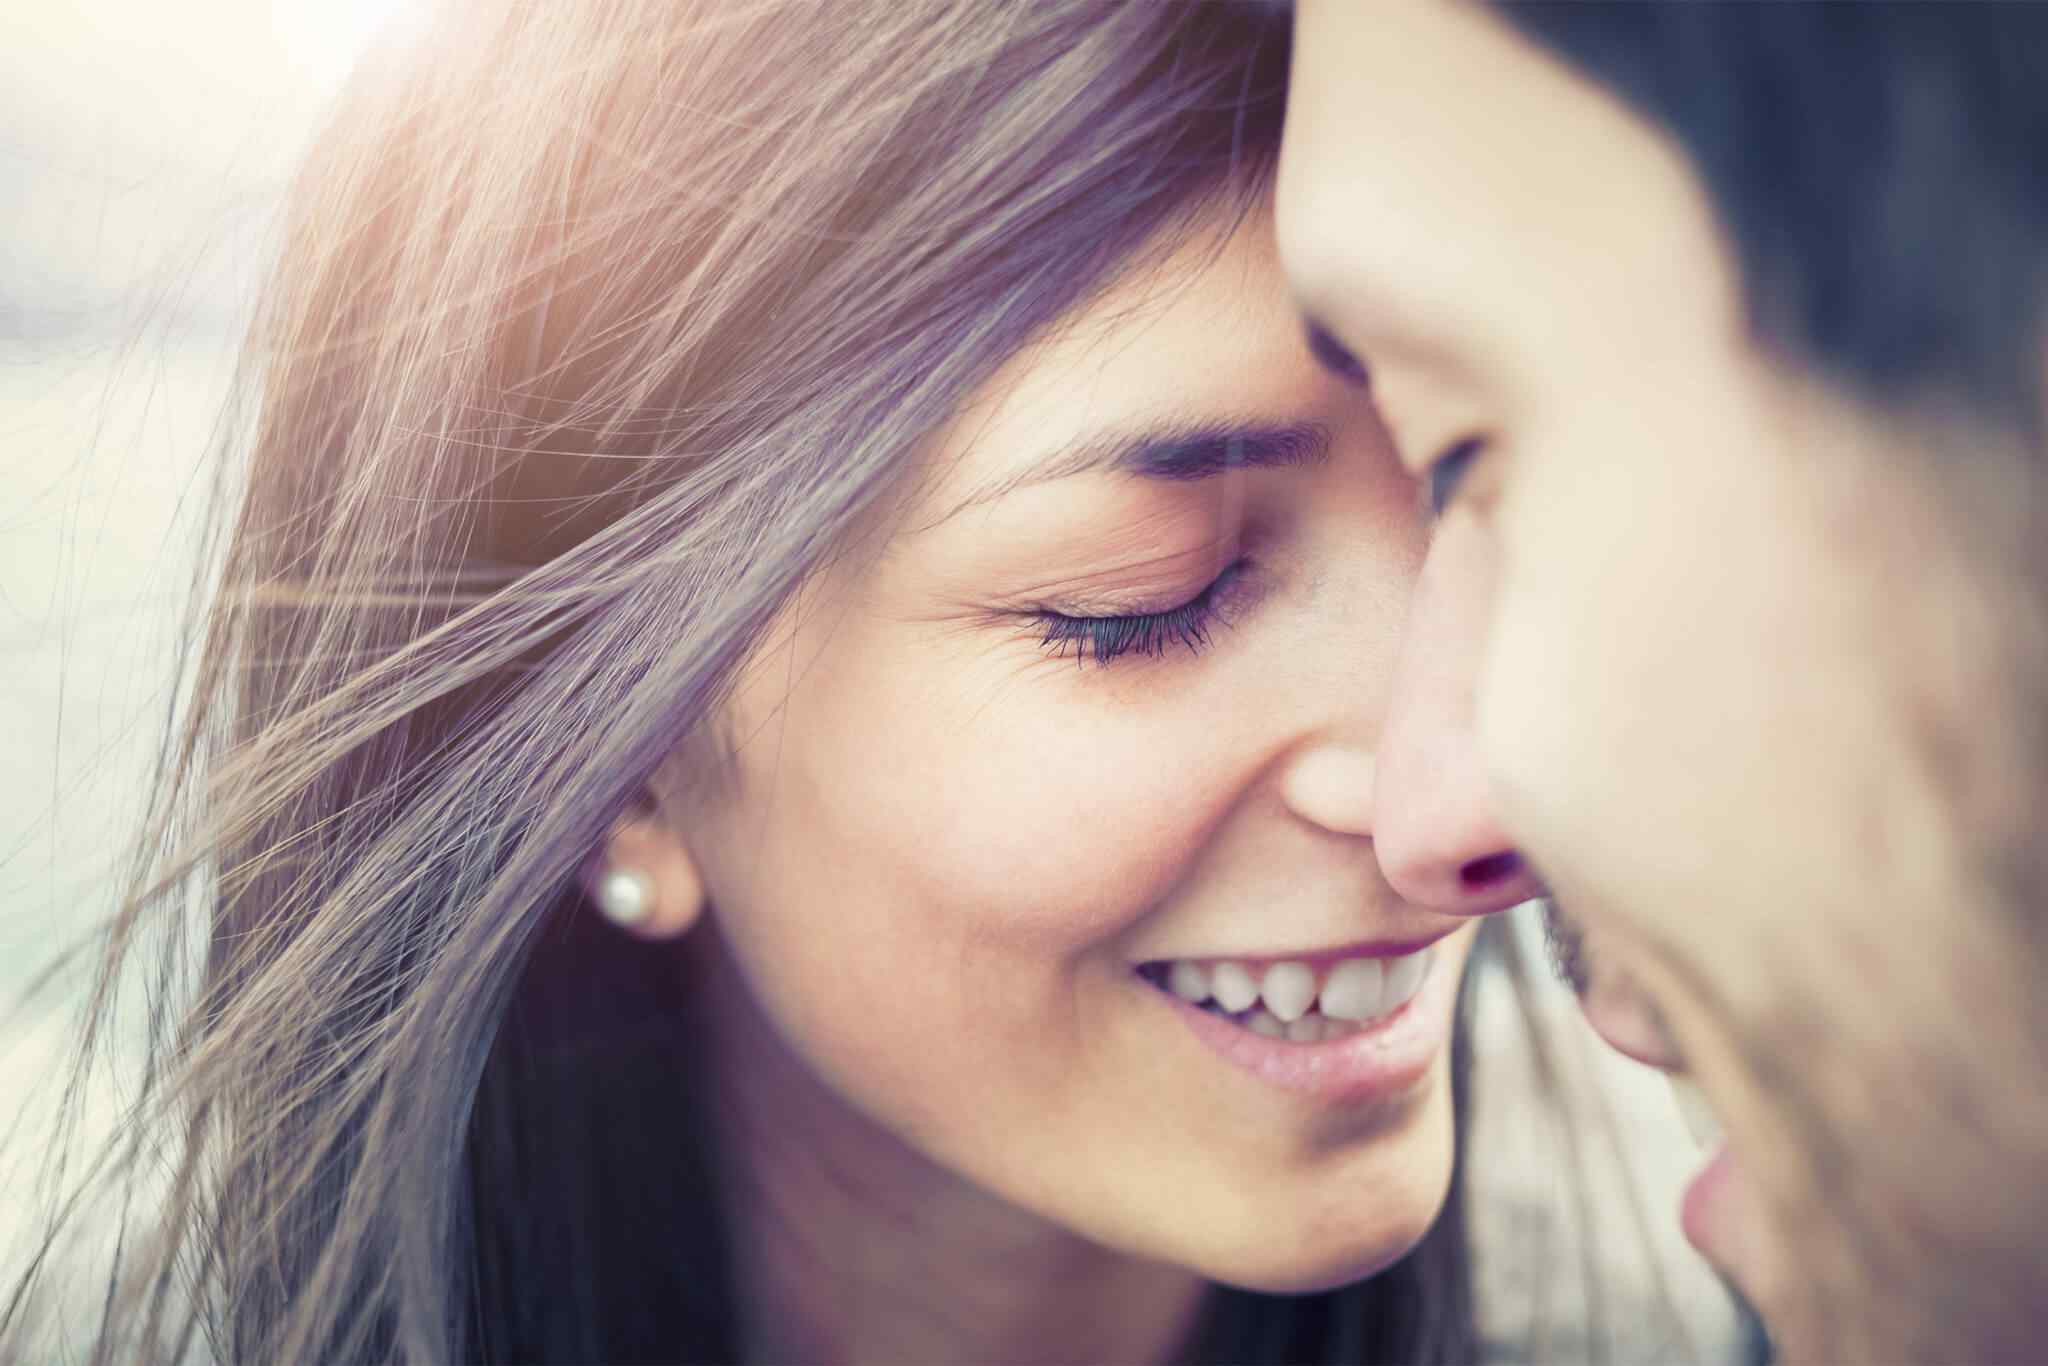 https://anavillarrubia.com/wp-content/uploads/2018/01/img-class-marriage-01.jpg